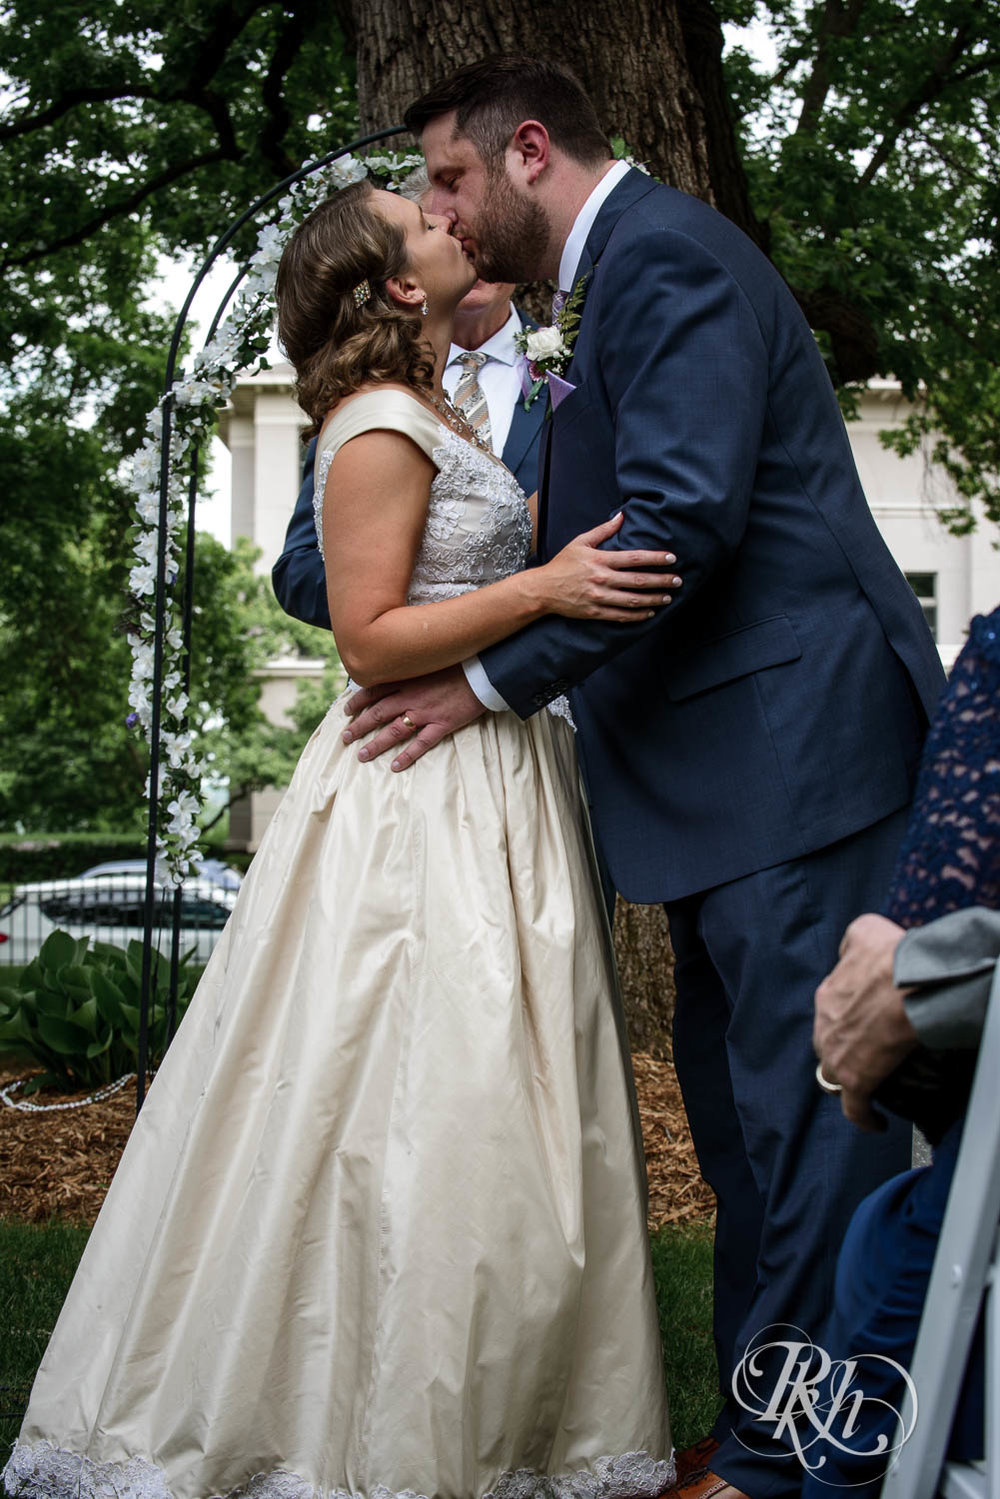 Jenna & Karl - Minnesota Wedding Photography - Summit Manor - RKH Images - Samples  (32 of 36).jpg